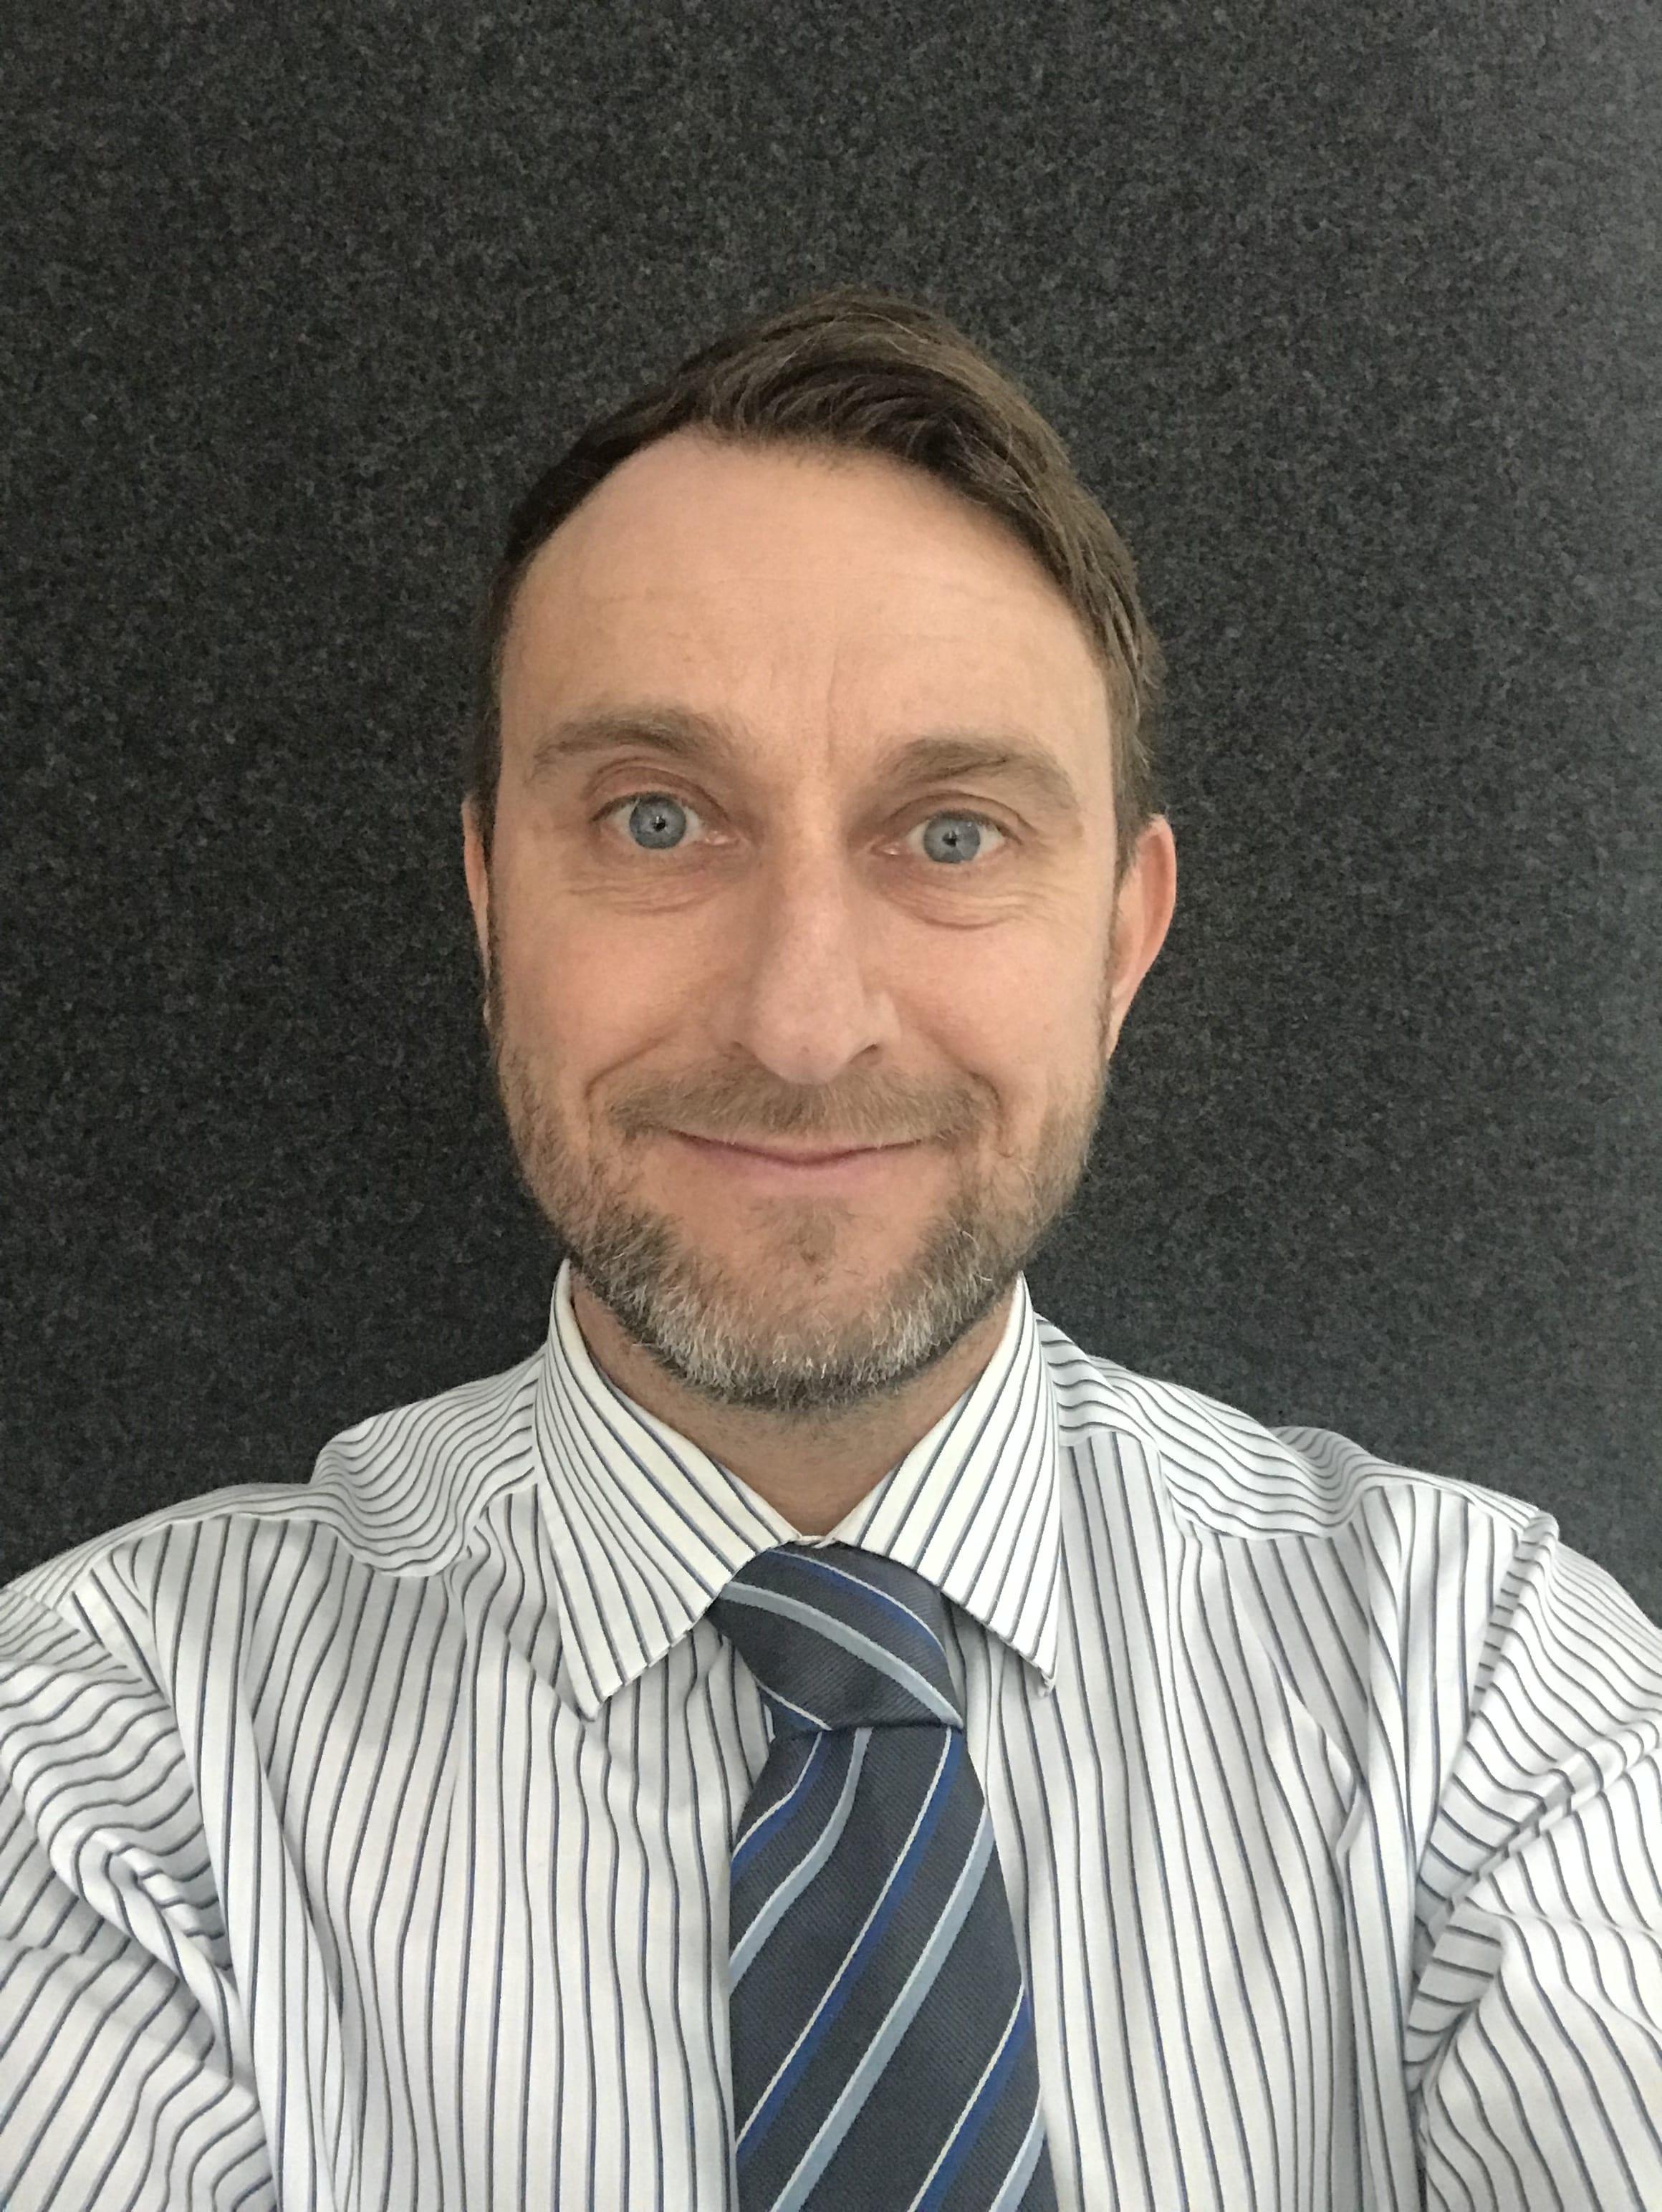 Adam Bradley wearing a striped shirt and tie in a selfie